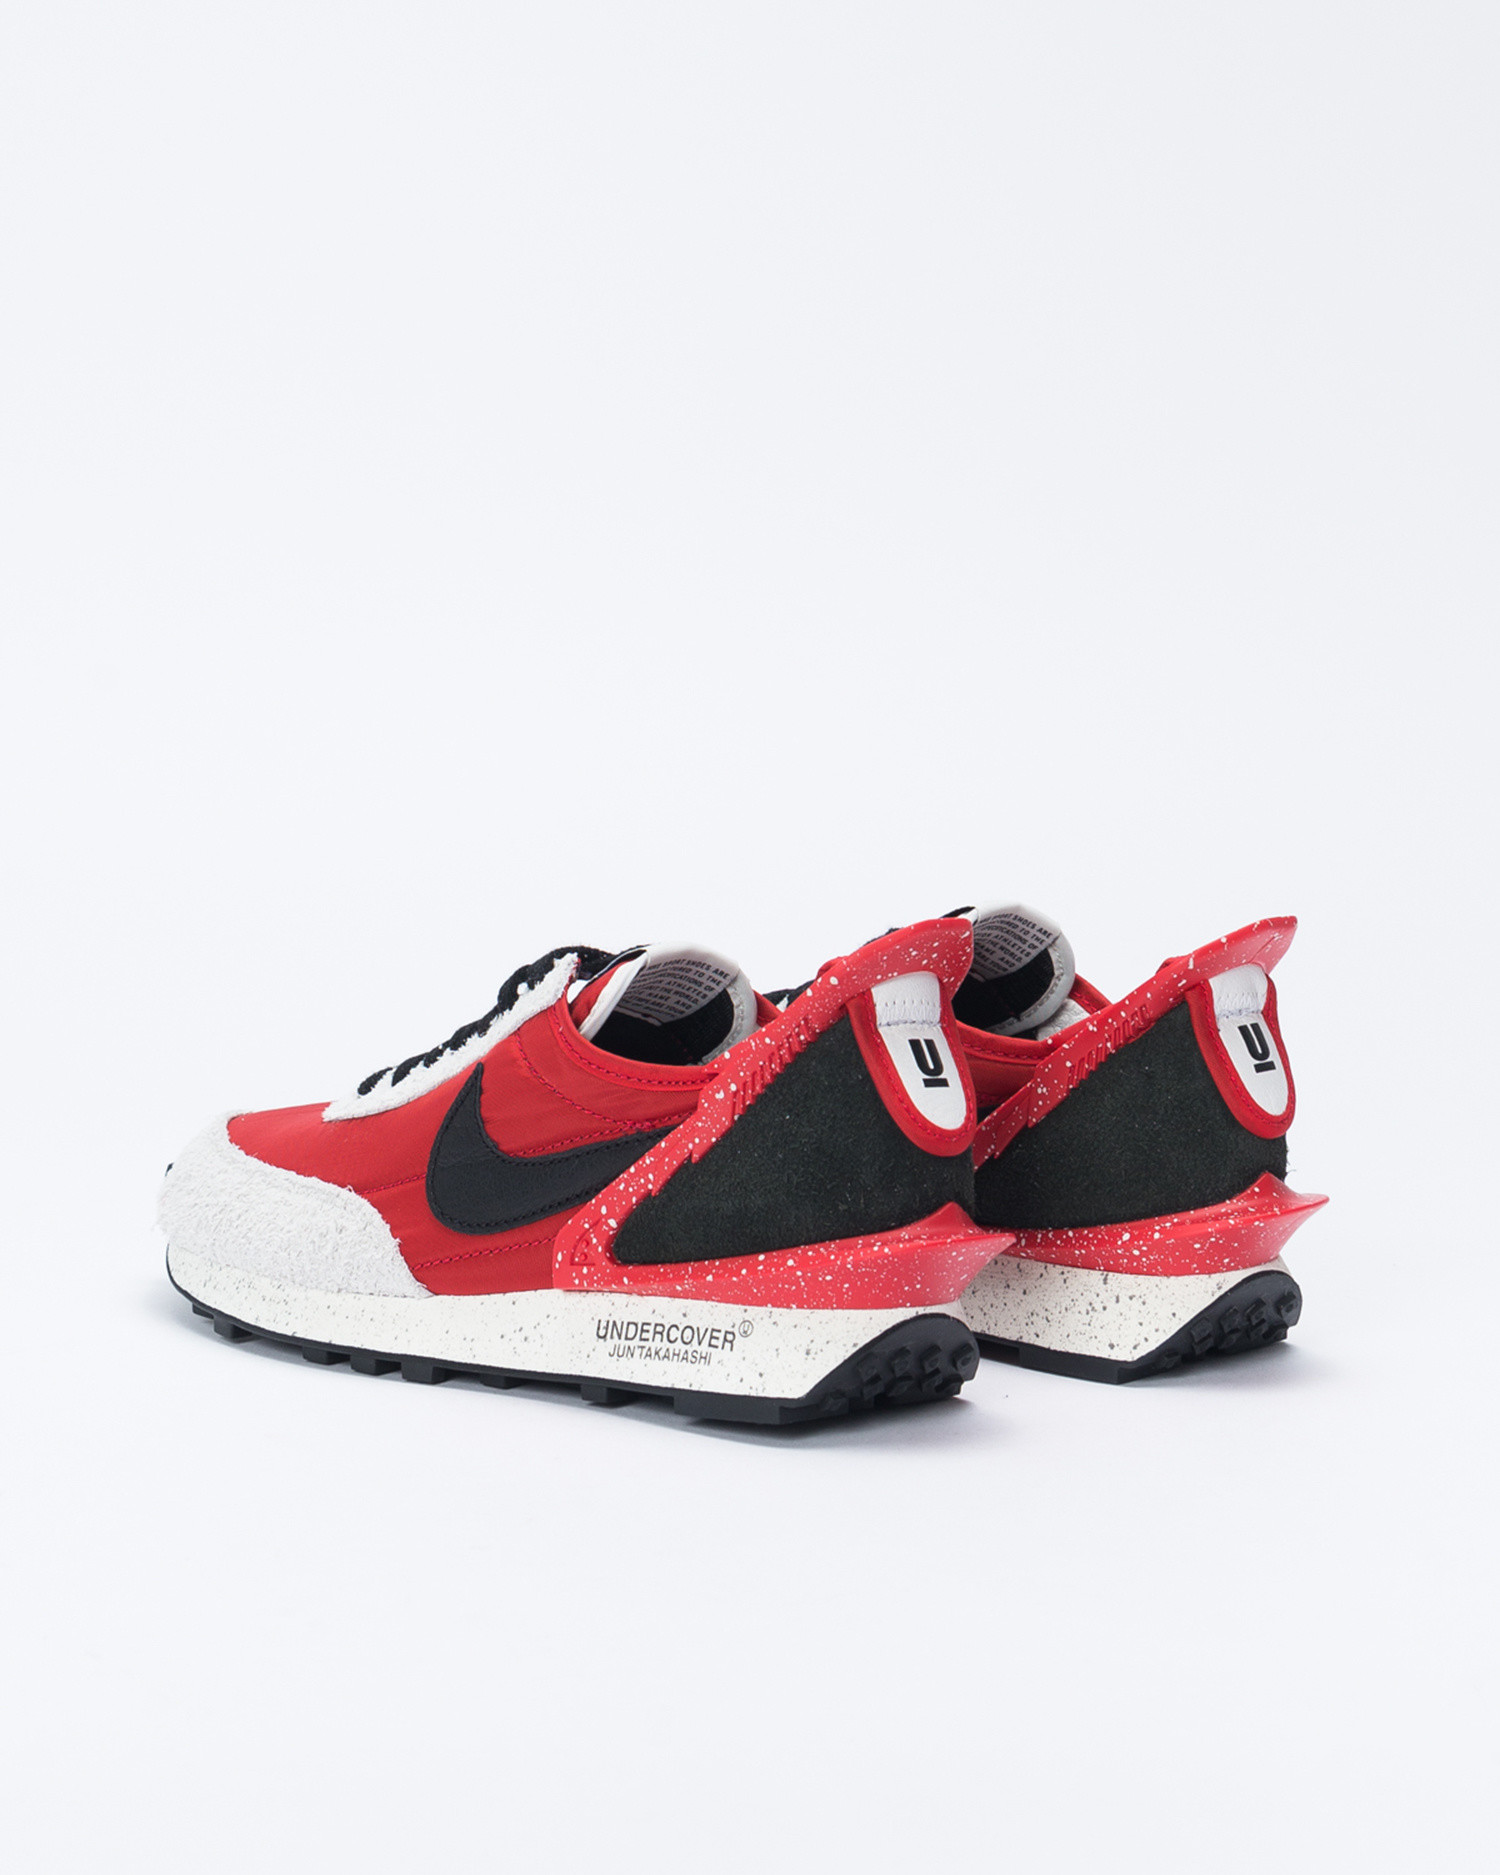 Nike x Undercover Womens Daybreak University Red/Black-Spruce Aura